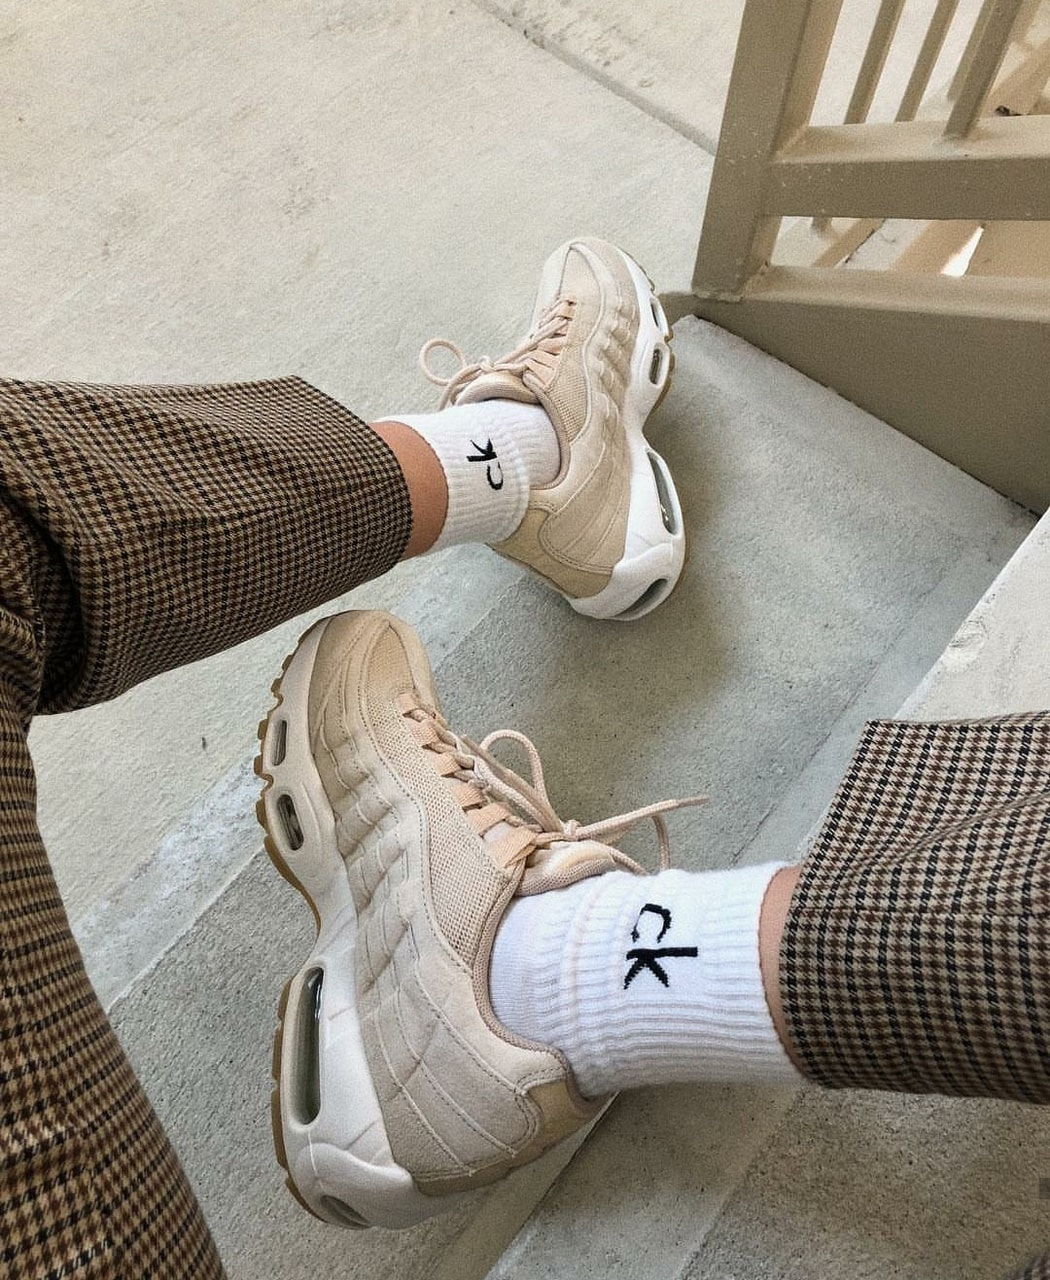 Calvin Klein, CK, and fashion image